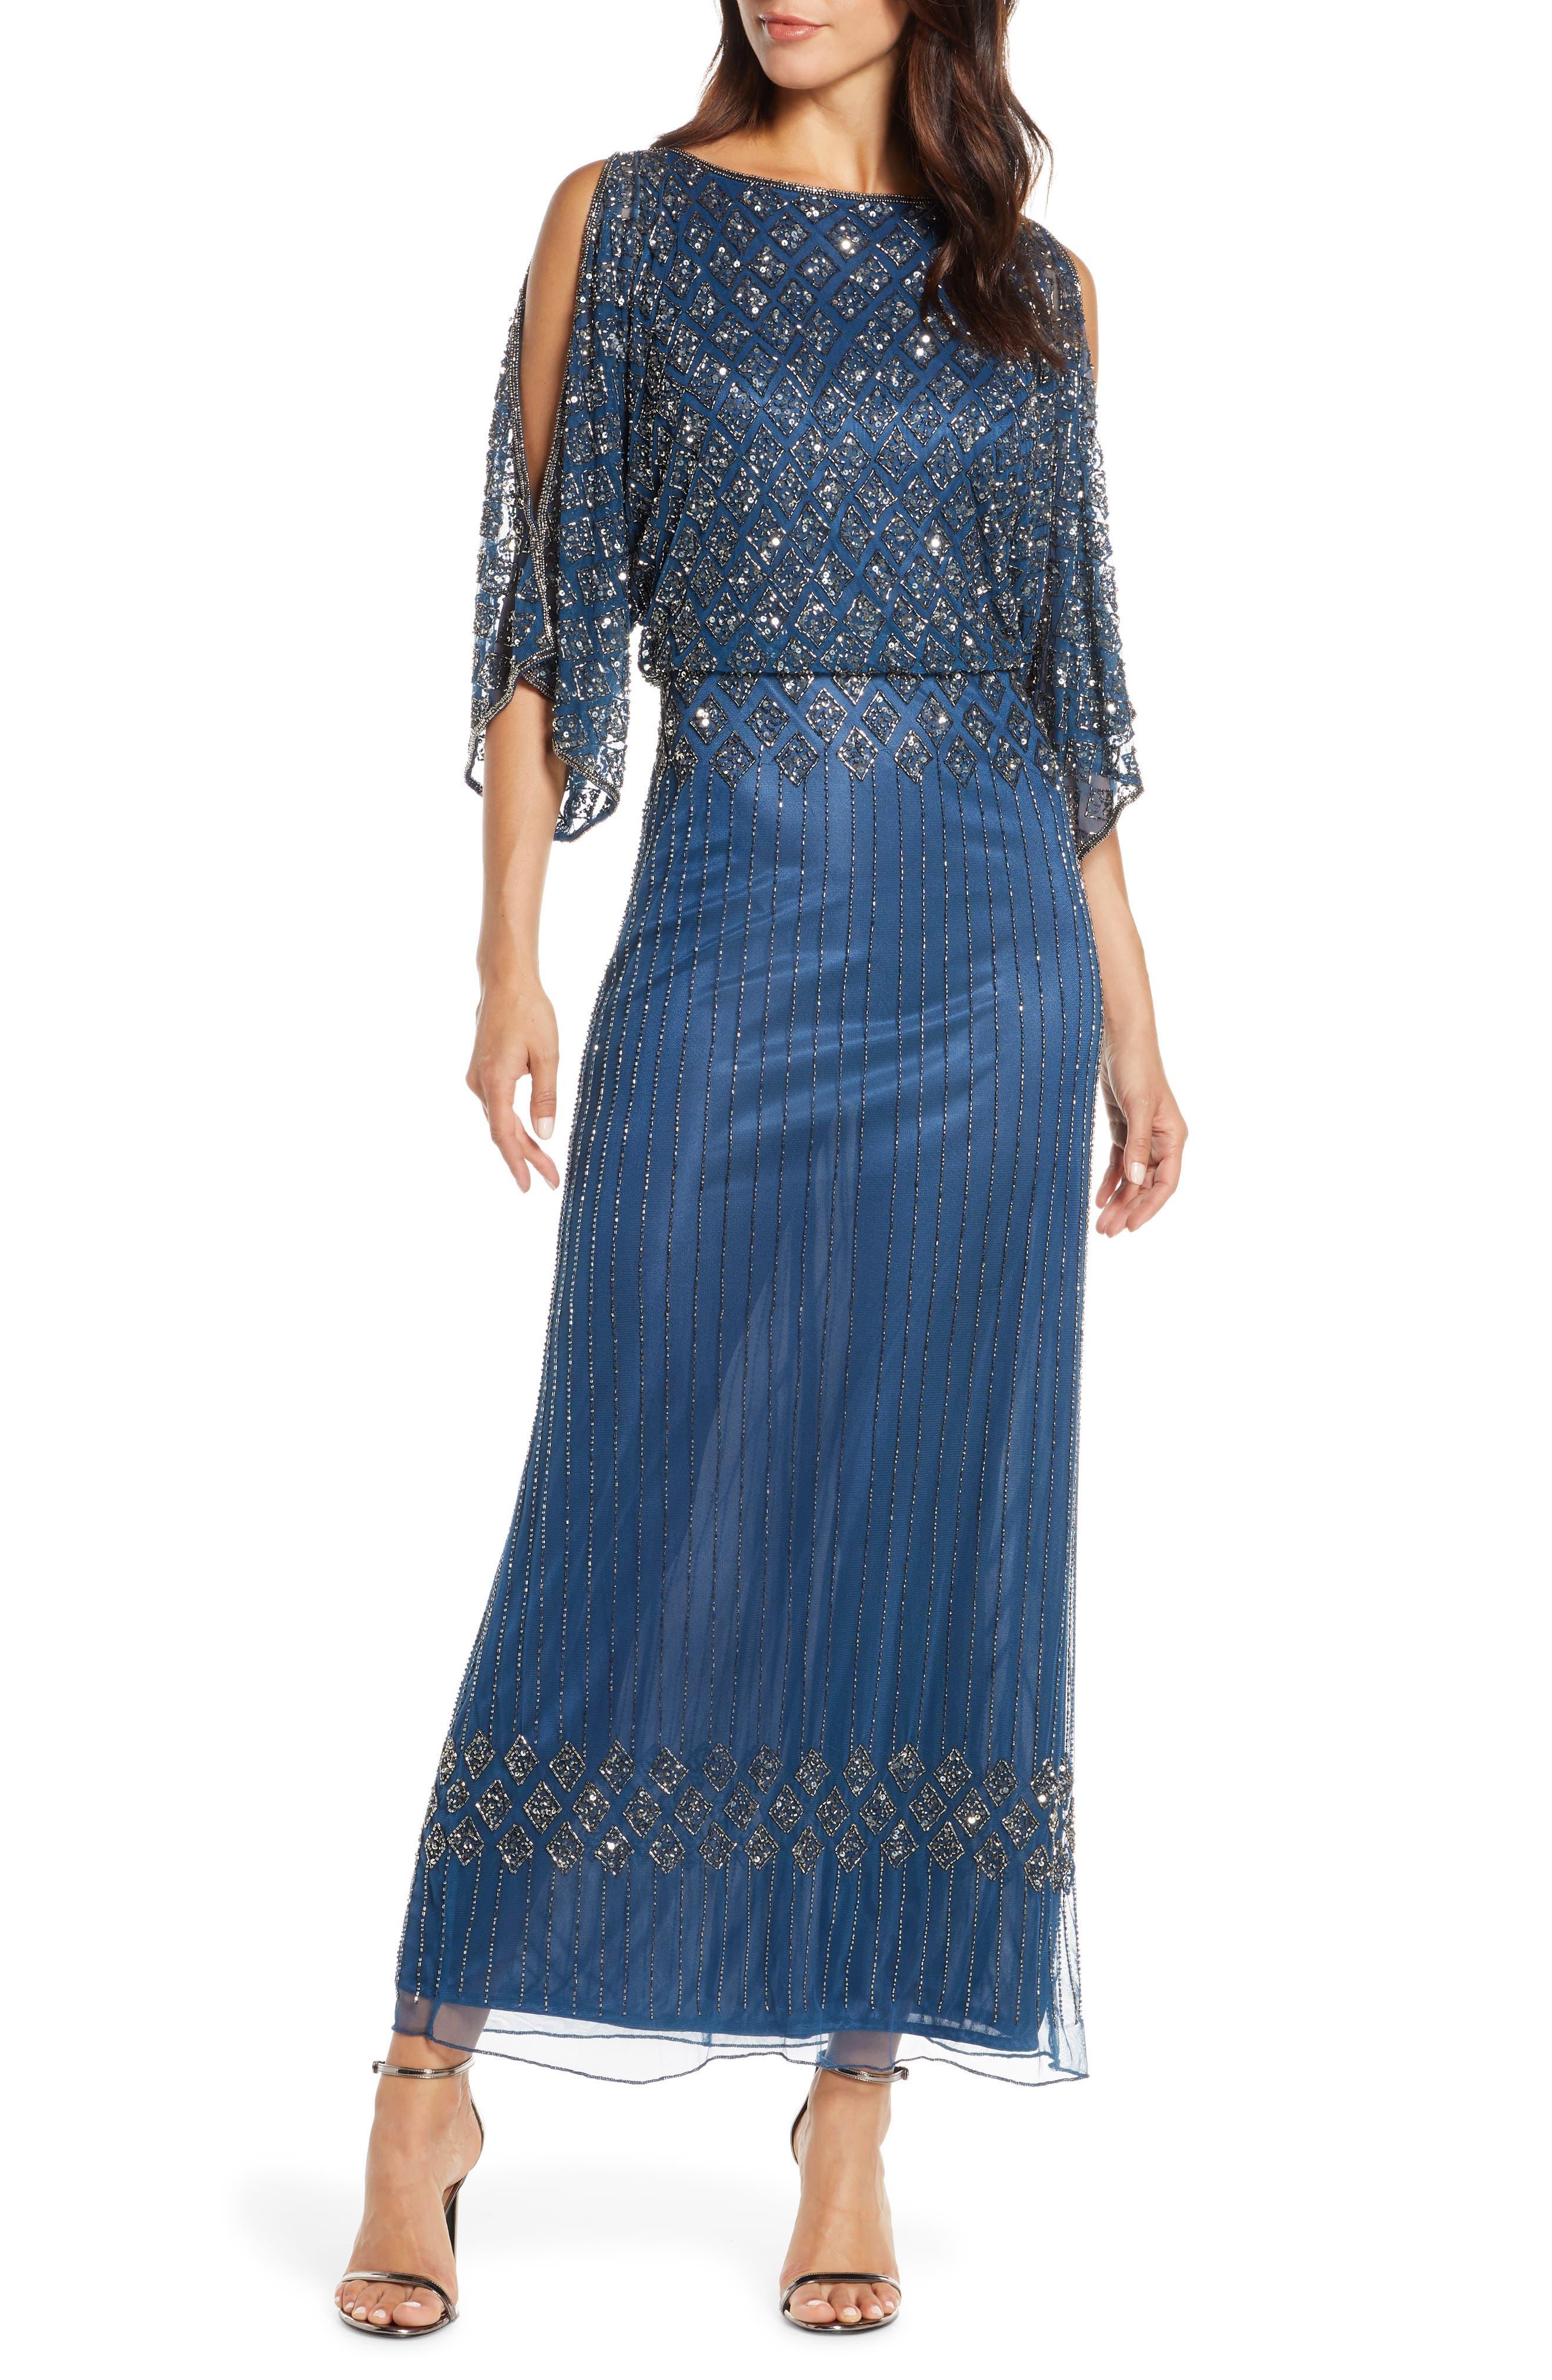 Charleston Dress: Fringe Flapper Dress Womens Pisarro Nights Diamond Motif Mesh Blouson Gown Size 16 - Blue $198.00 AT vintagedancer.com